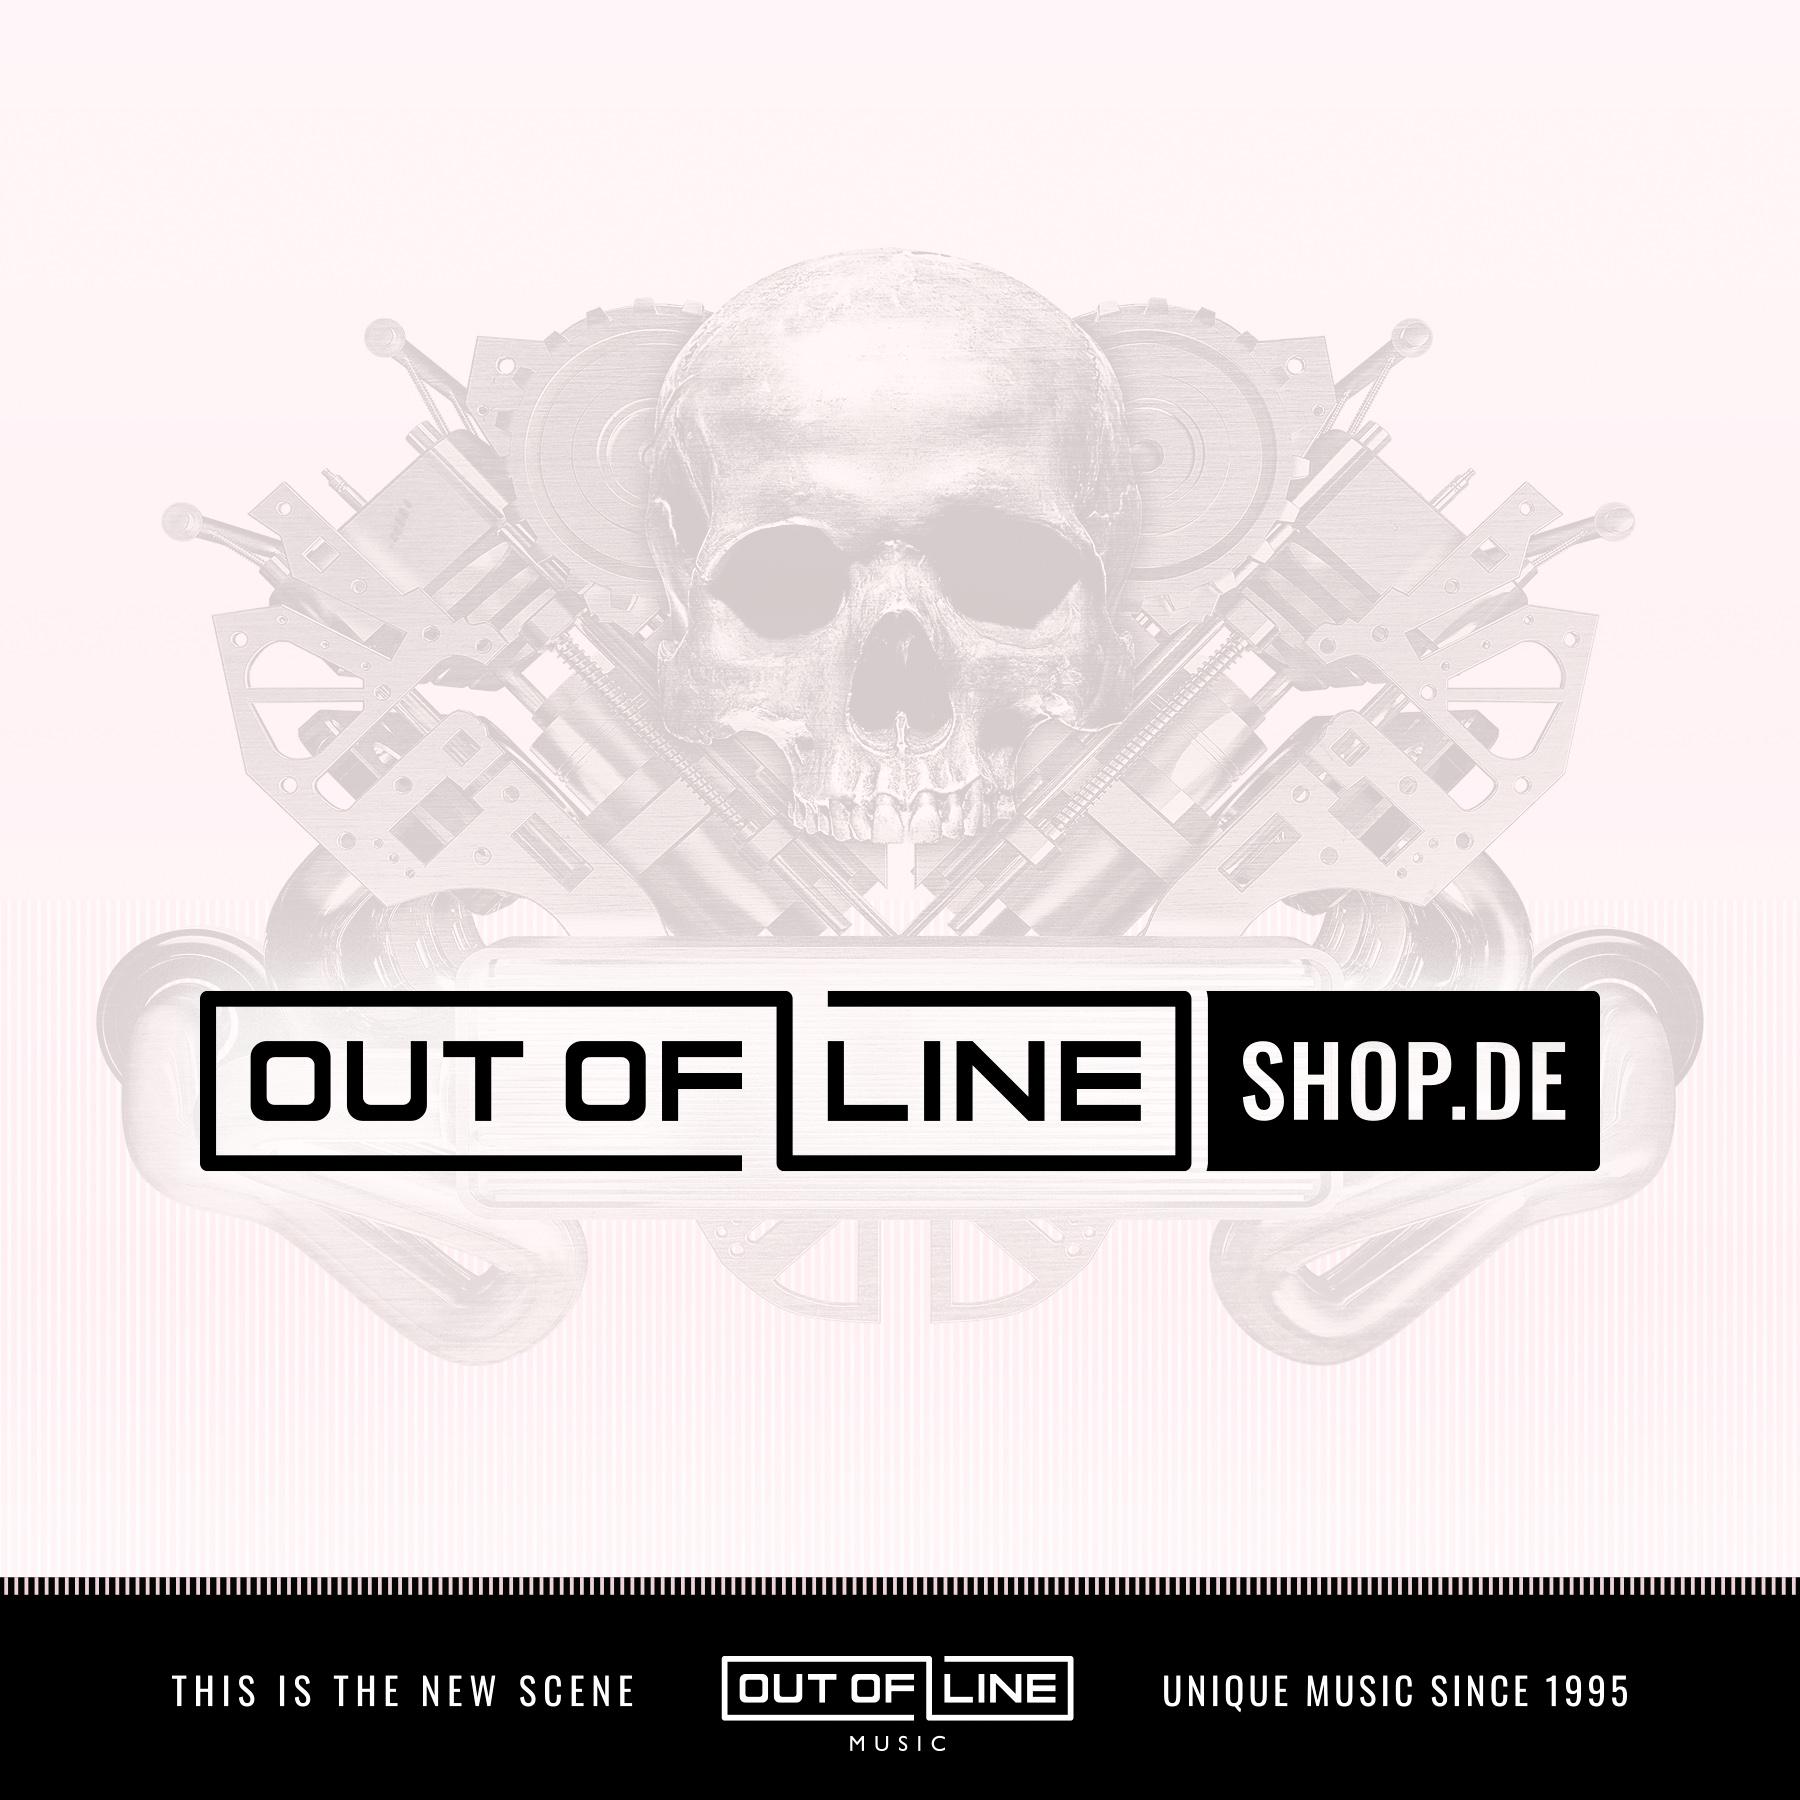 Kirlian Camera - Eclipse (Das schwarze Denkmal): Definitive Edition - 2CD